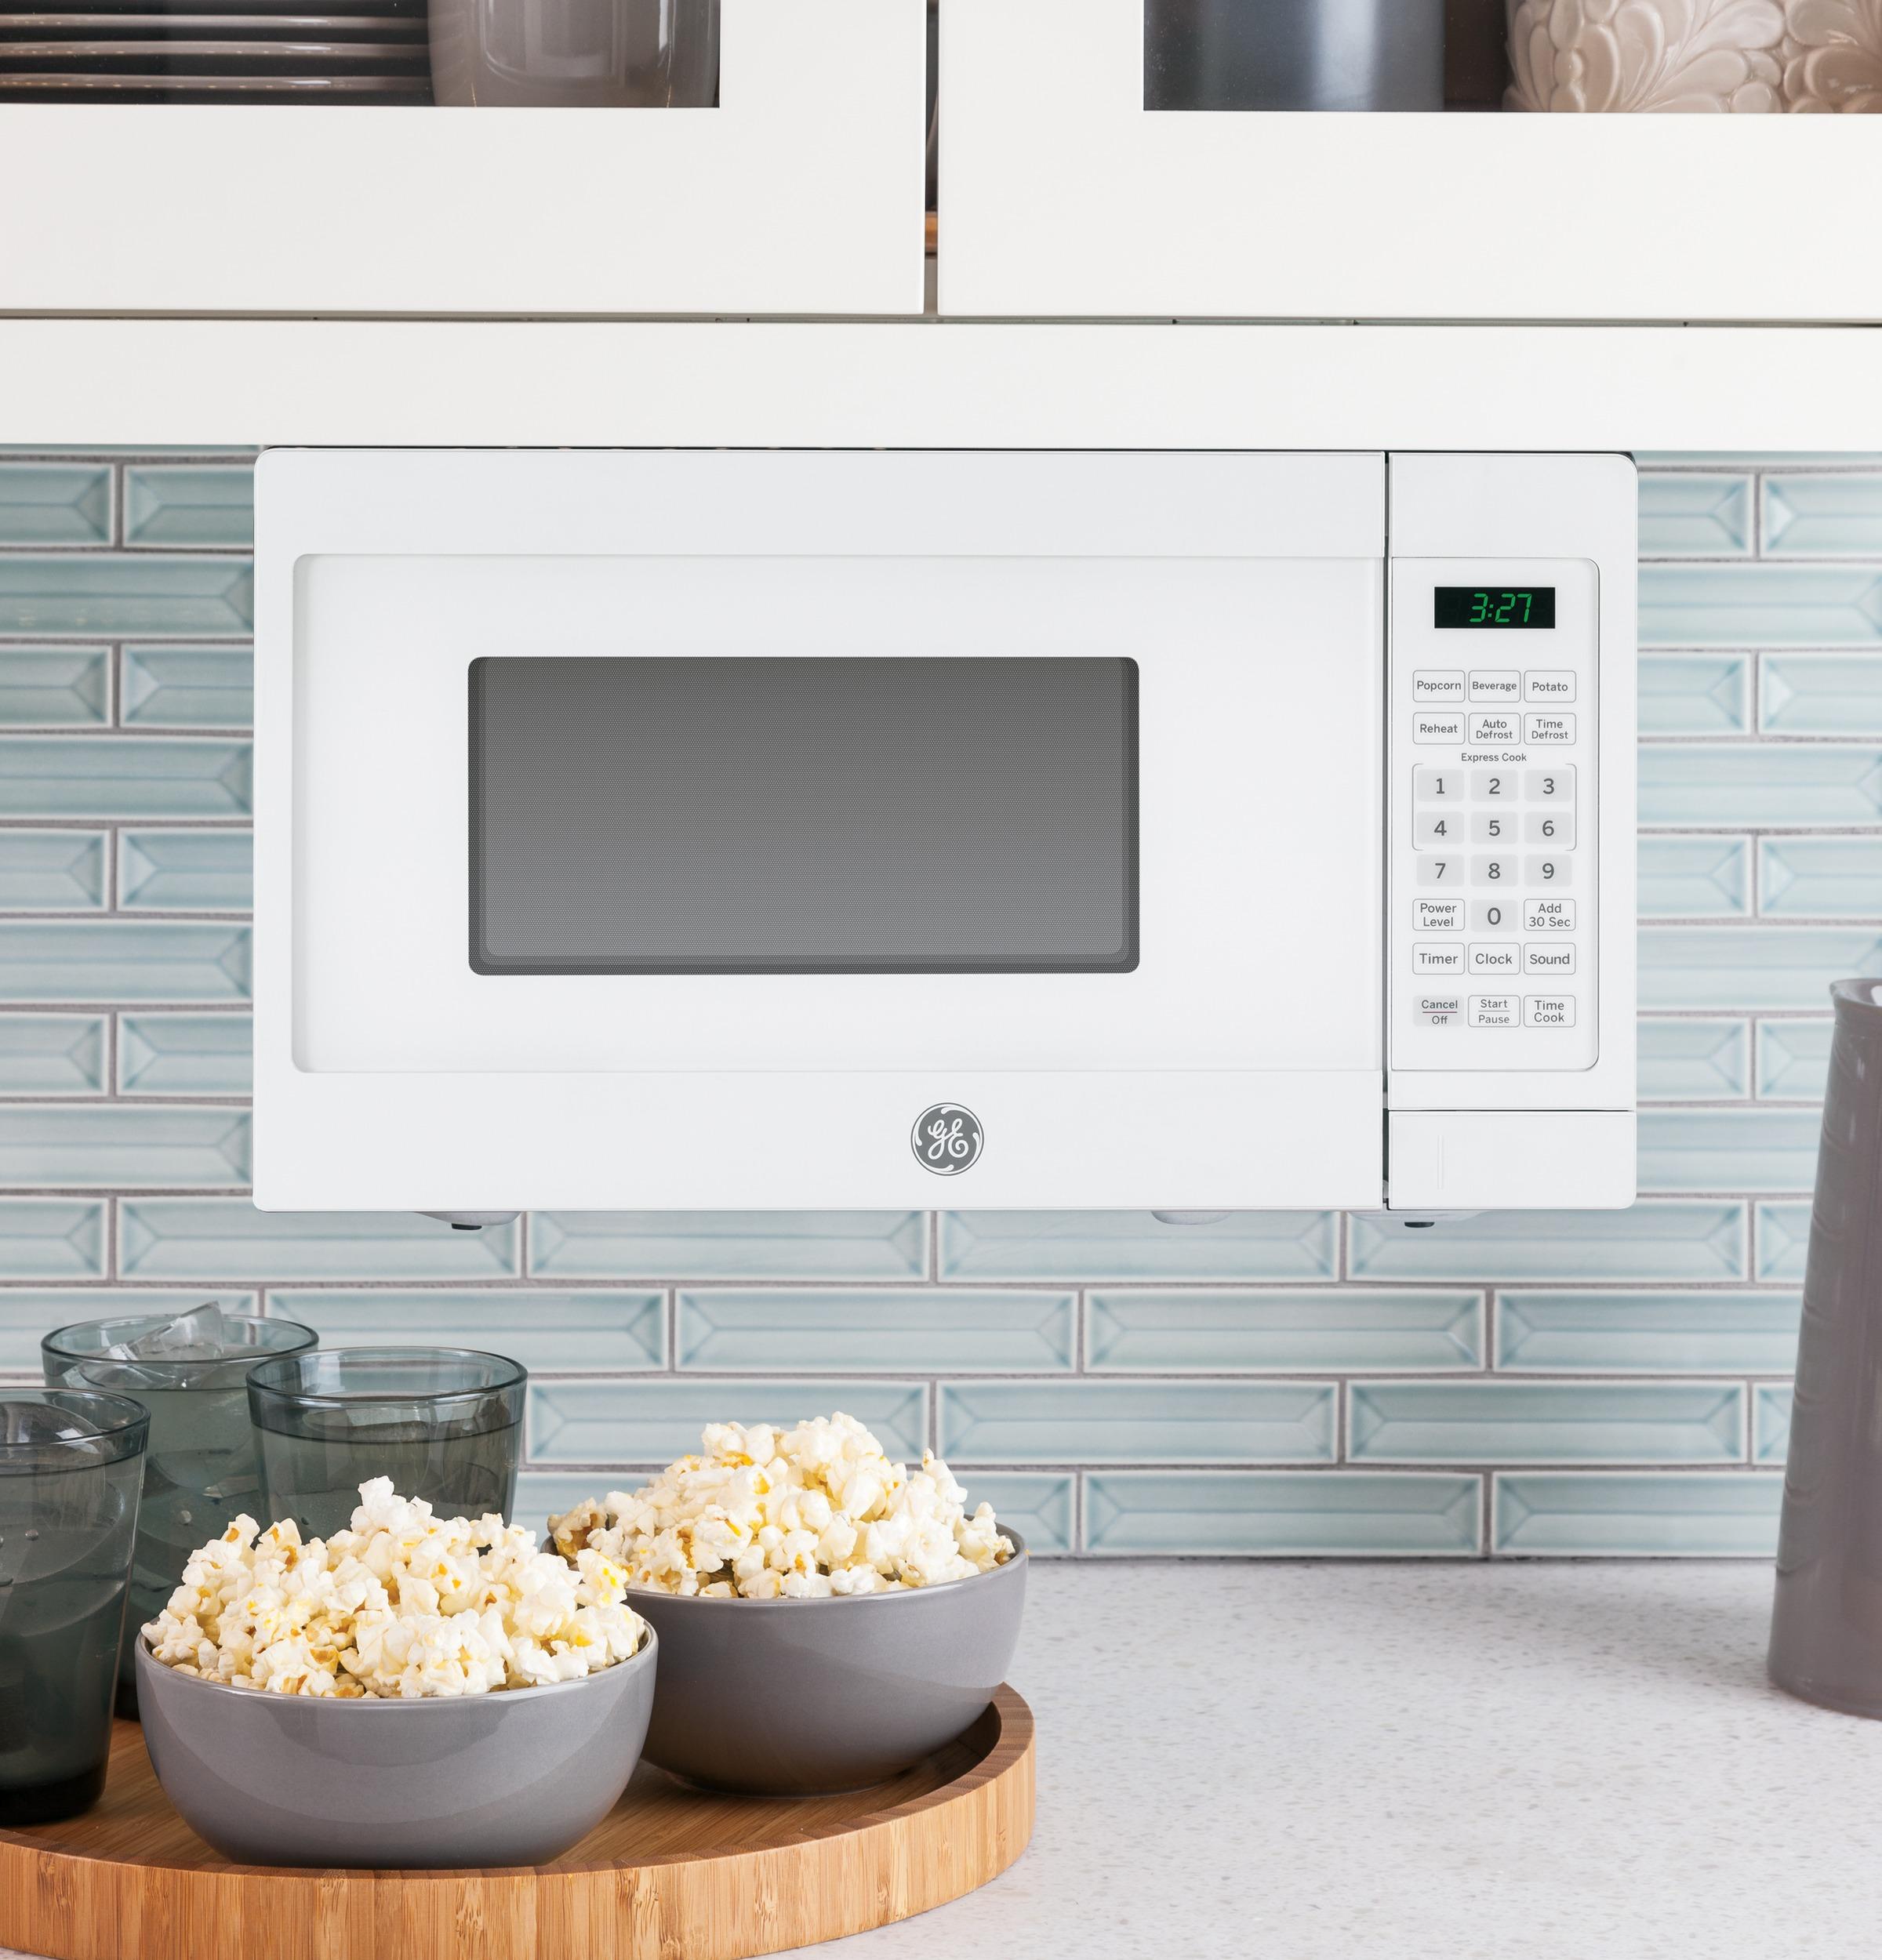 Model: JEM3072DHWW | GE GE® 0.7 Cu. Ft. Capacity Countertop Microwave Oven